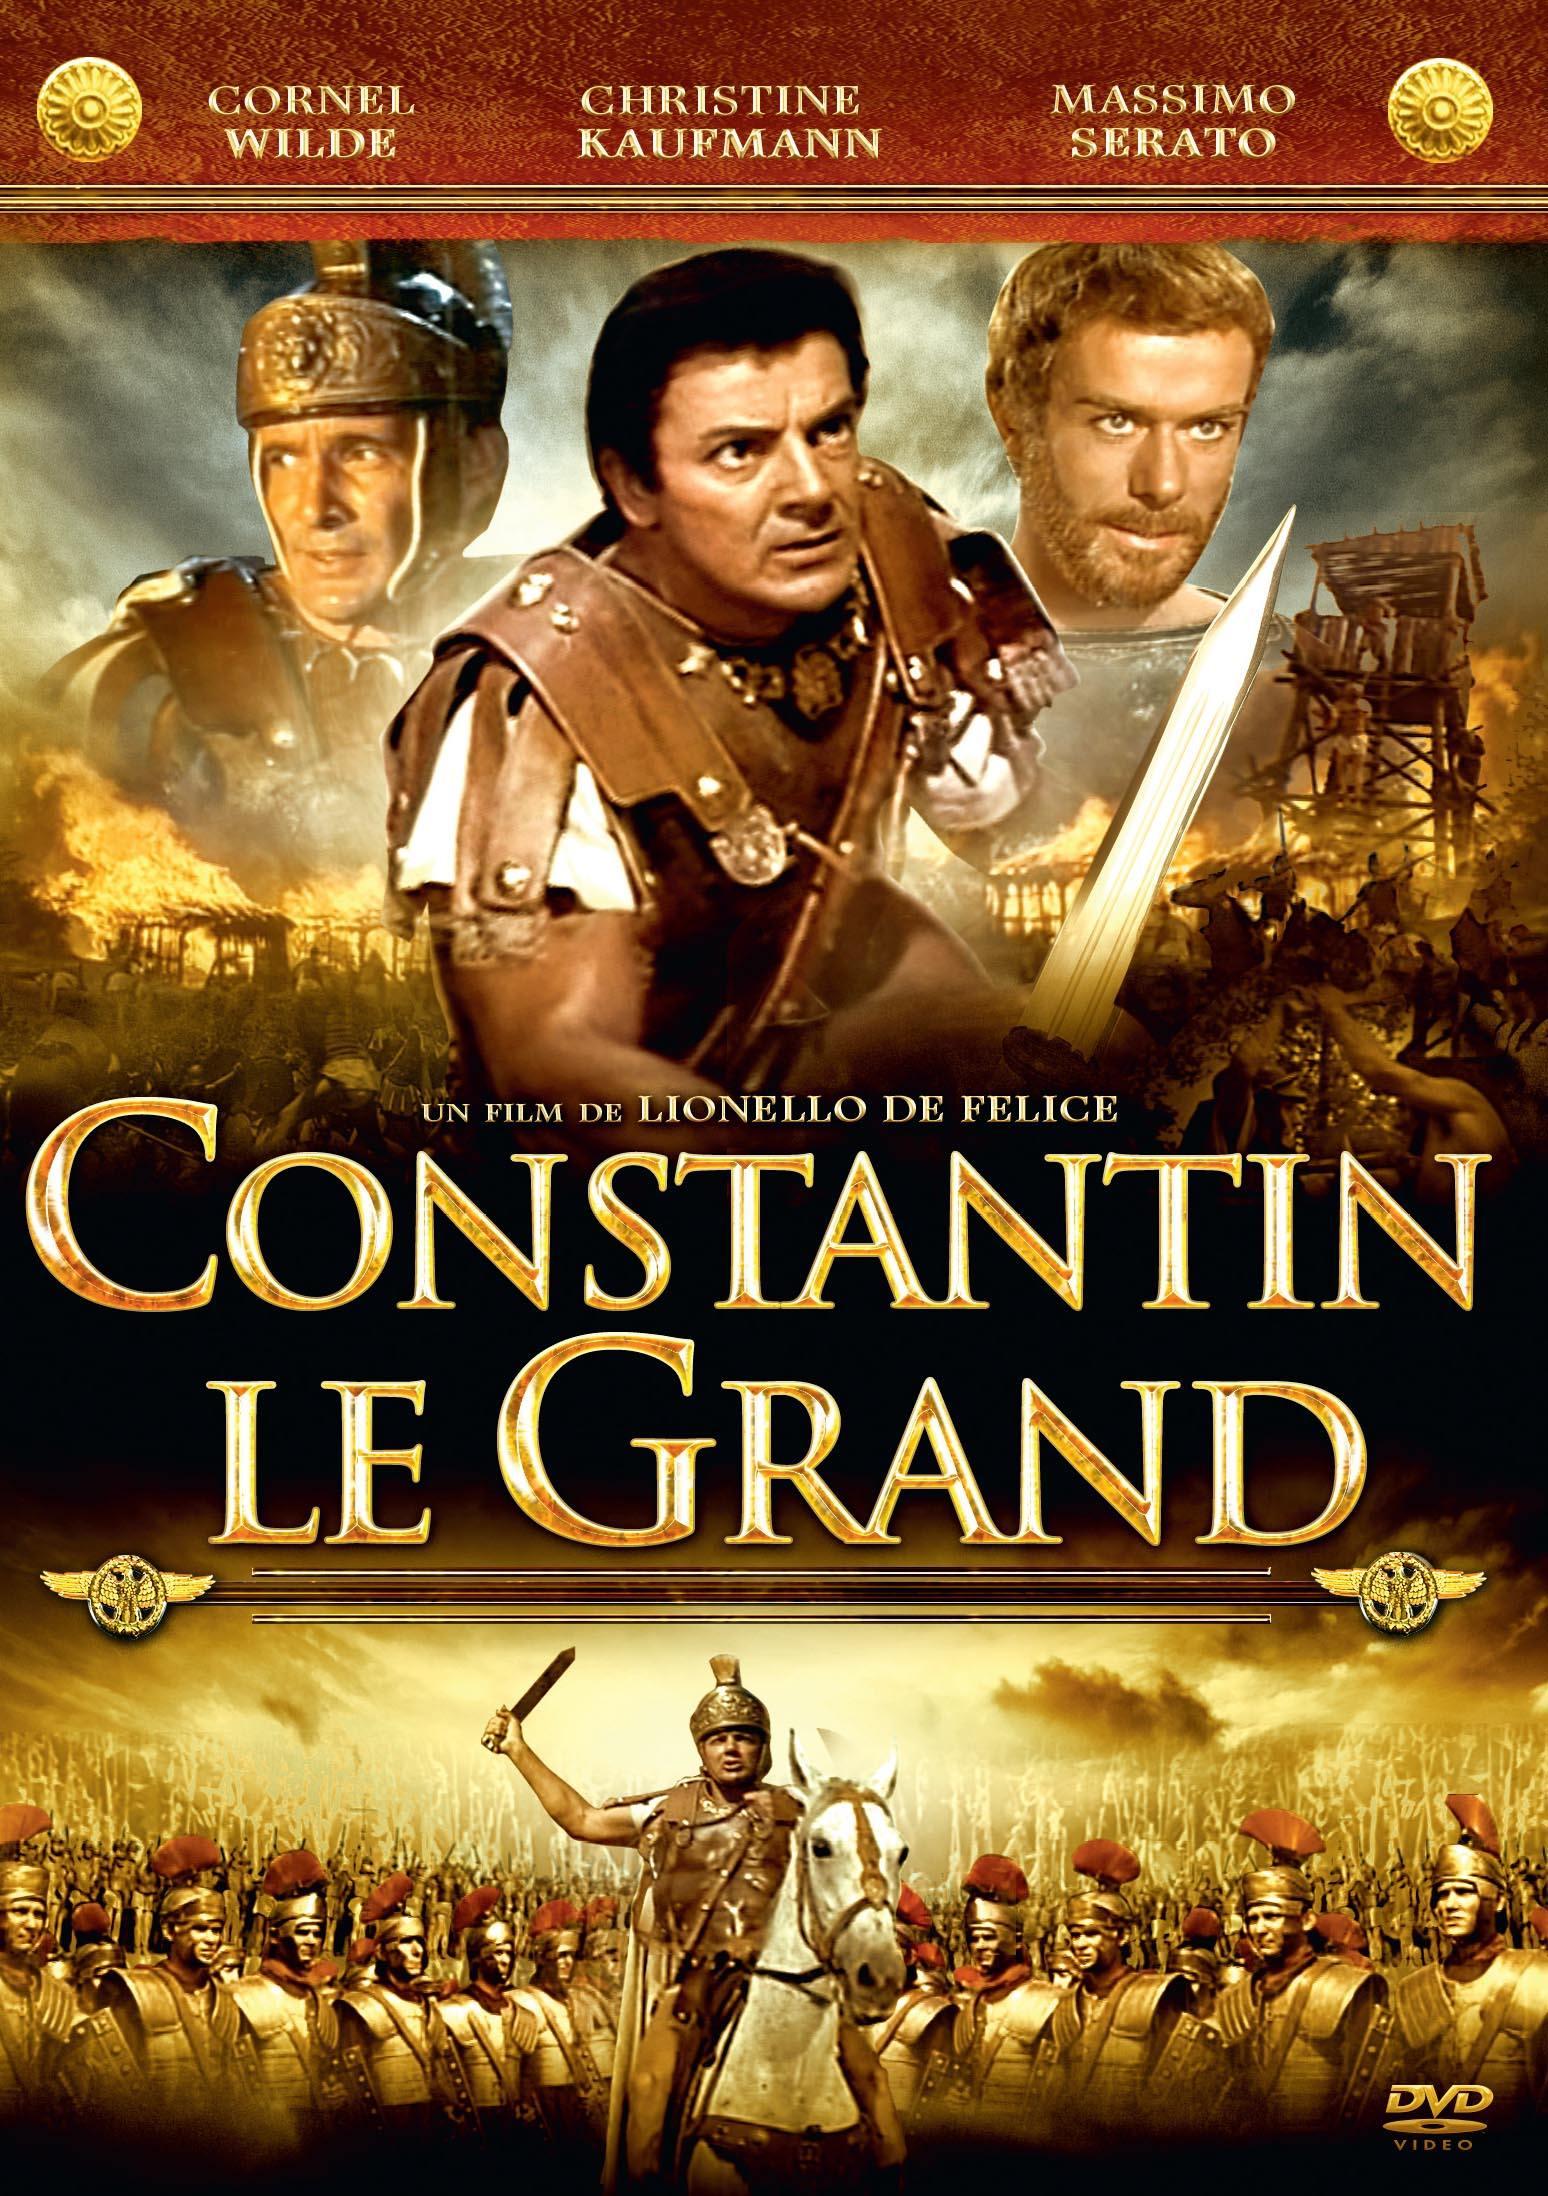 Constantin le grand - dvd